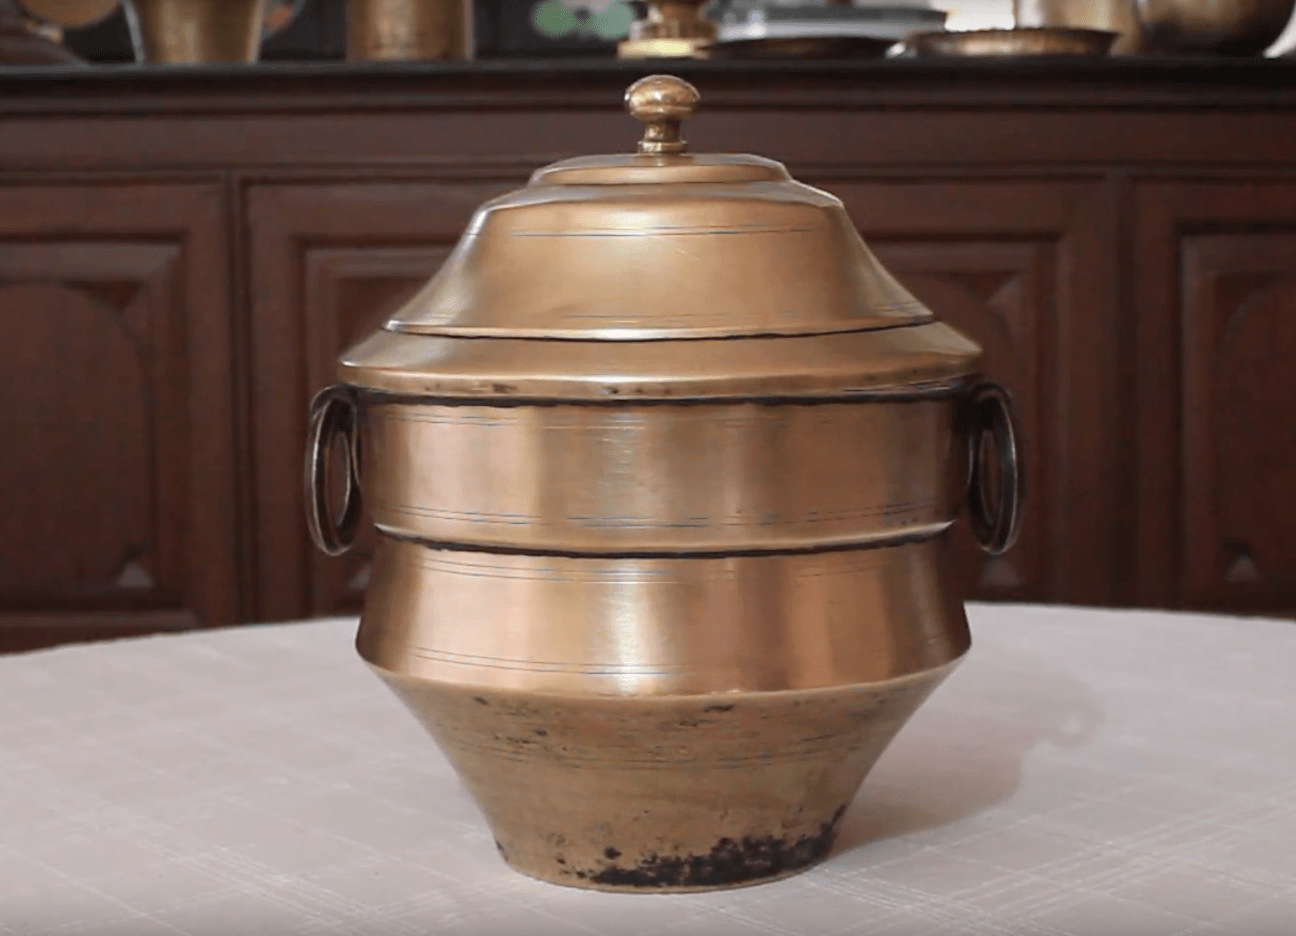 Antique Brass Idli Steamer (Idli Patra)